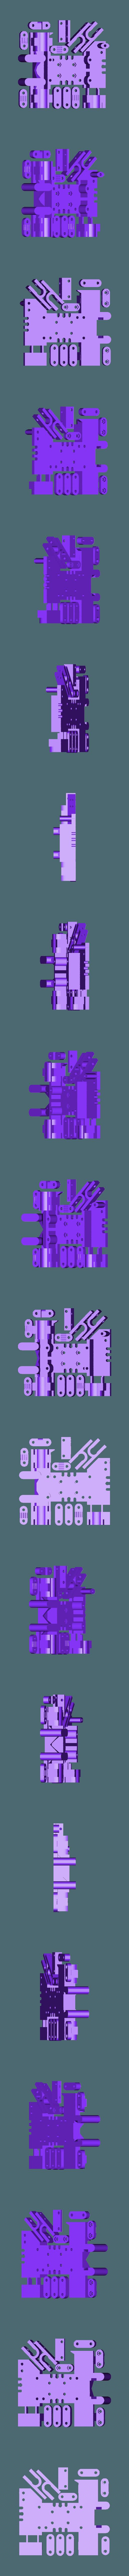 Tray-1.stl Download free STL file RepRapPro Mendel Trays • 3D printable model, Nessun_Dorma